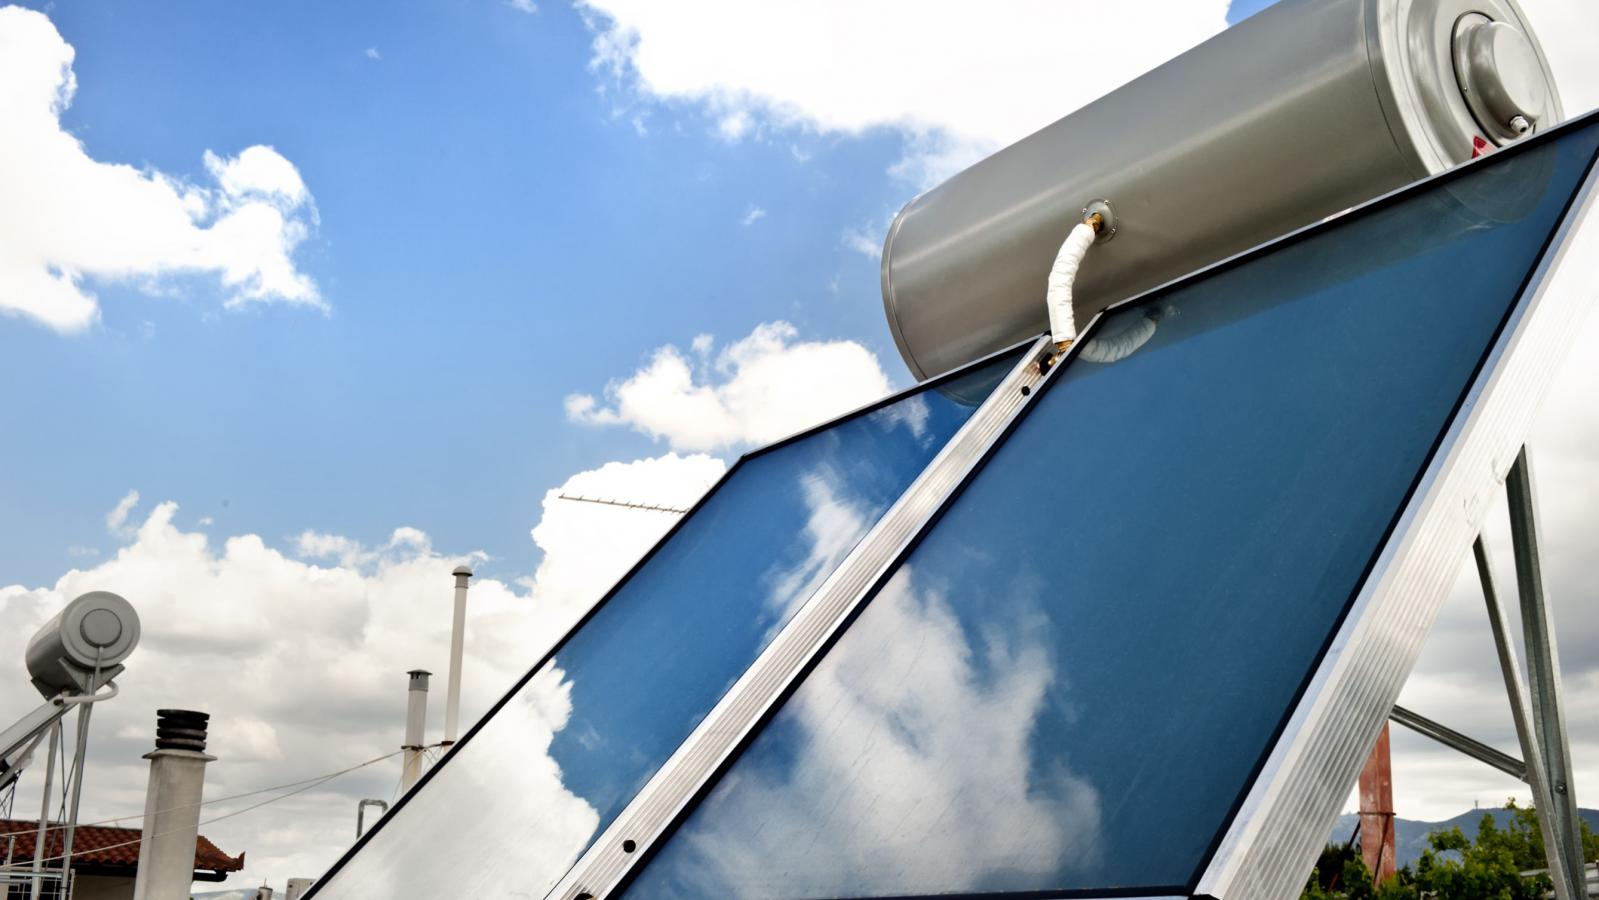 O ηλιακός θερμοσίφωνας αποτελεί μία απόλυτα ορθή επιλογή για μια κατοικία ώστε να αποκτήσει αυτή, εύκολα και απλά, ζεστό νερό χρήσης.